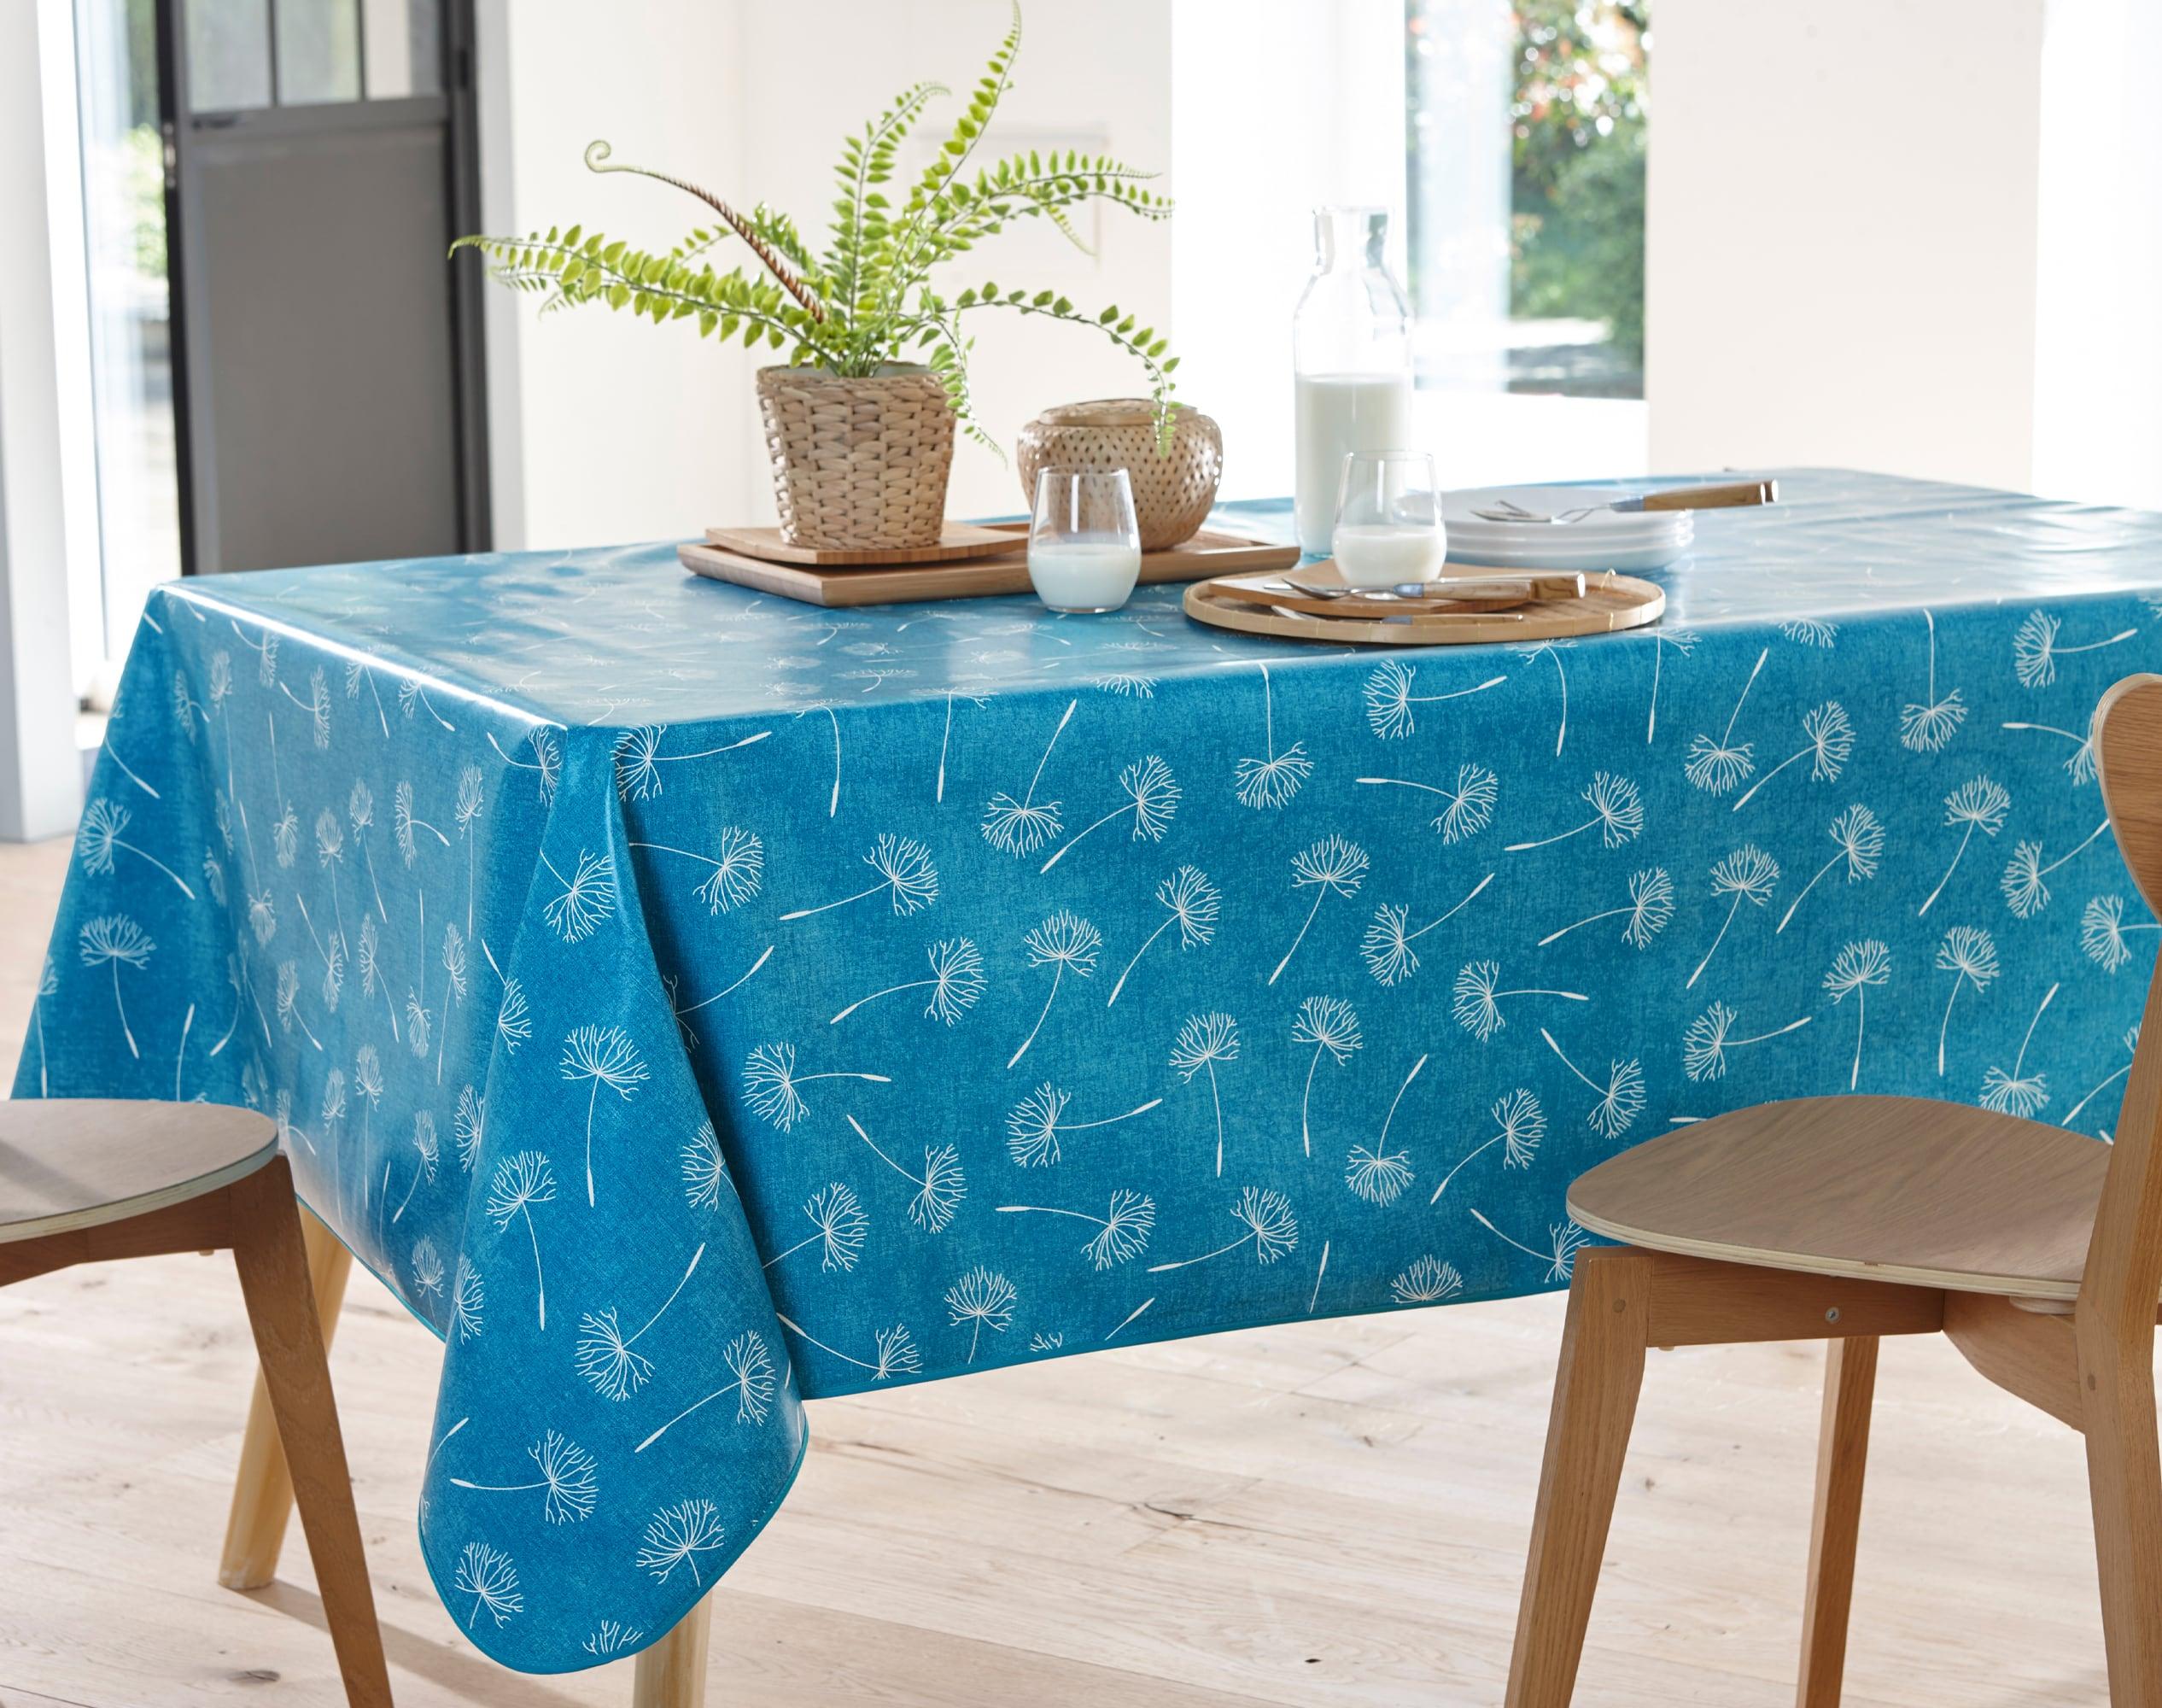 Nappe rectangulaire bleu canard en à motifs 138x200